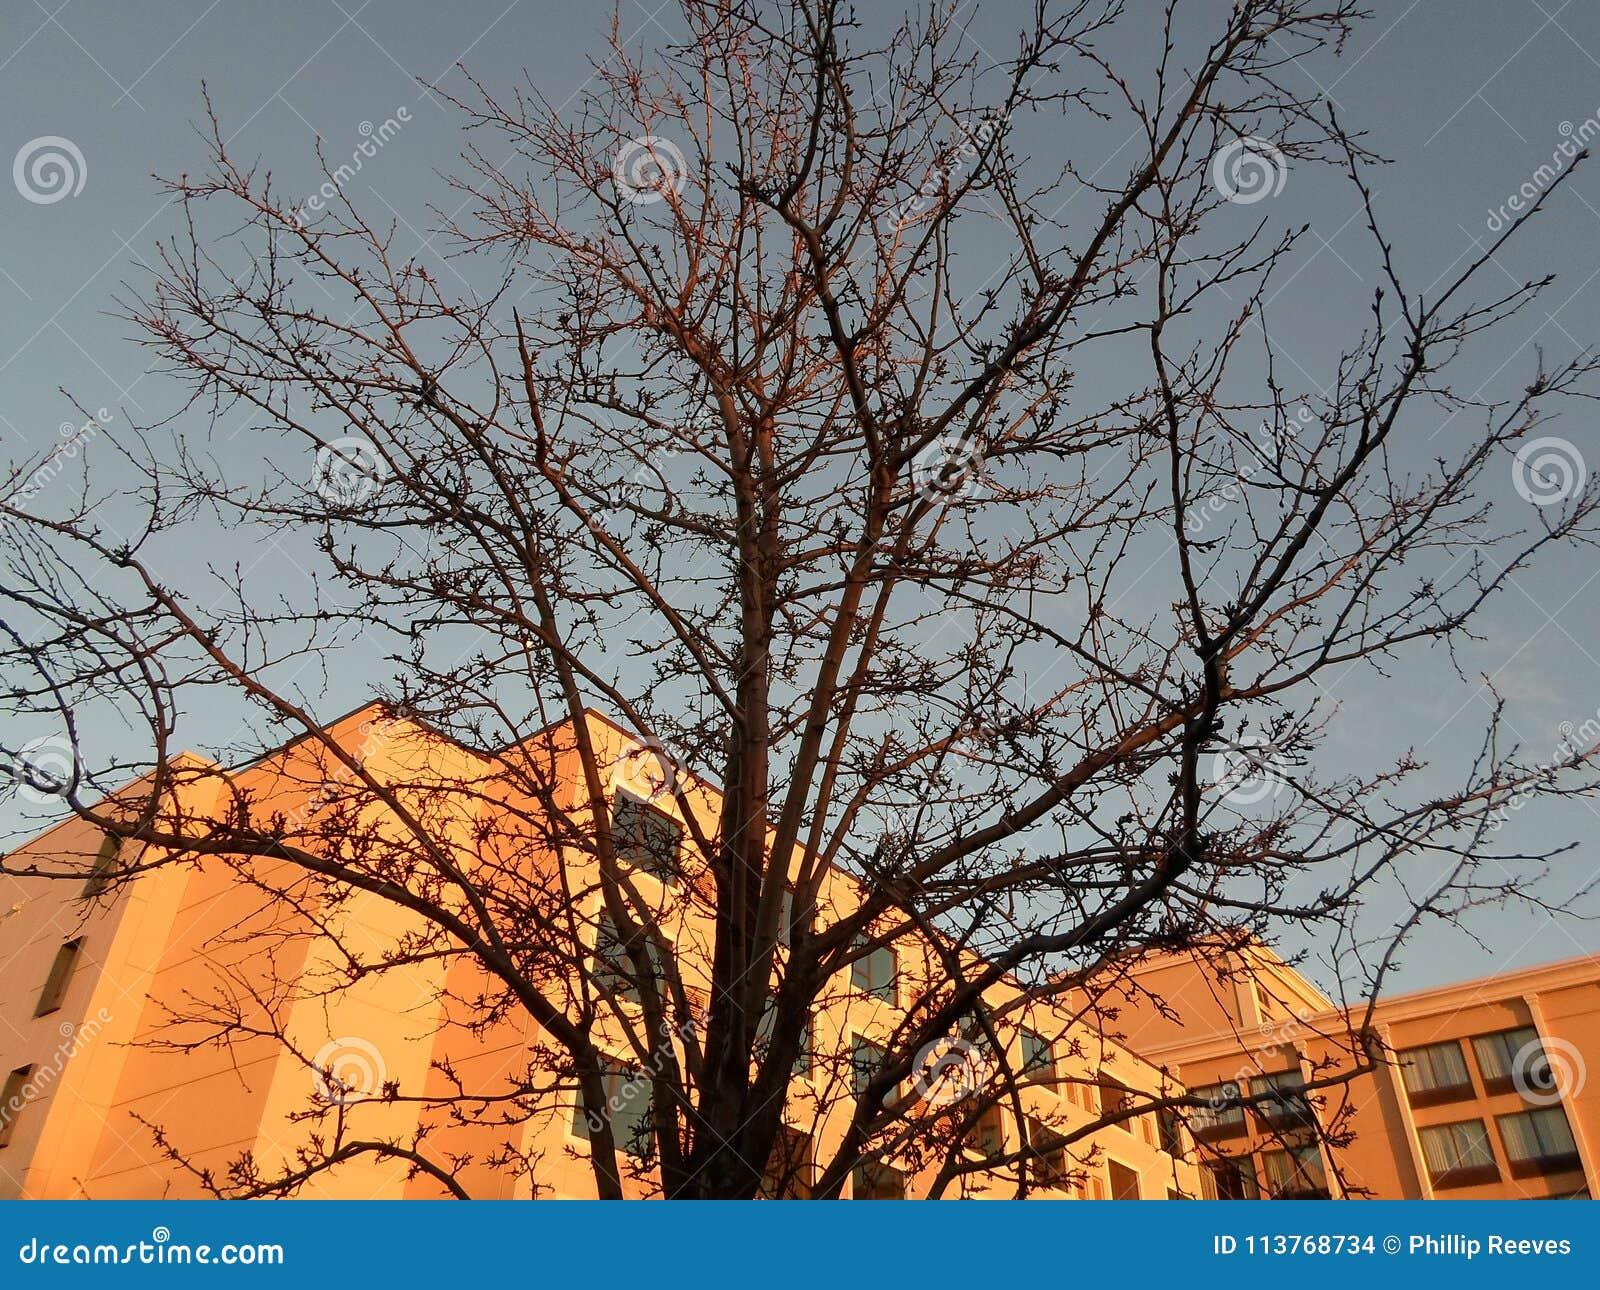 Drzewo, południe zatoki centrum, Dorchester, Massachusetts, usa